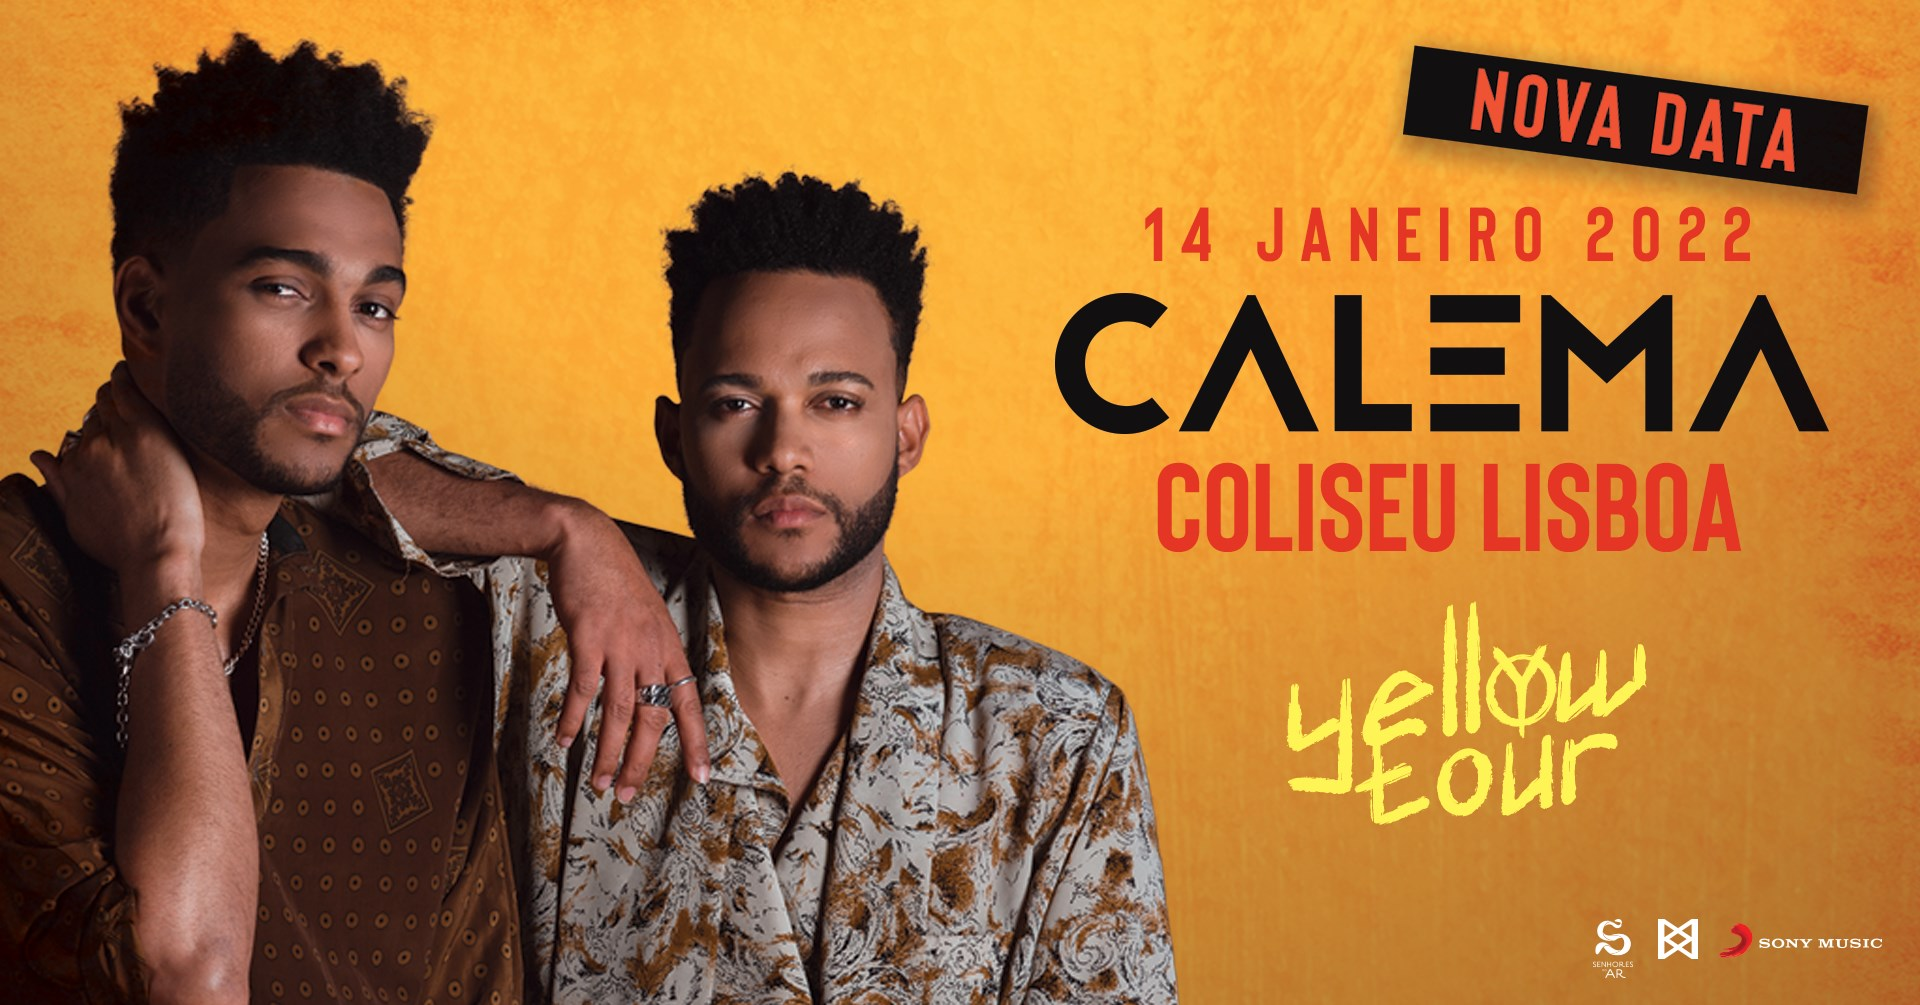 Calema | Coliseu de Lisboa - 14 de Janeiro 2022